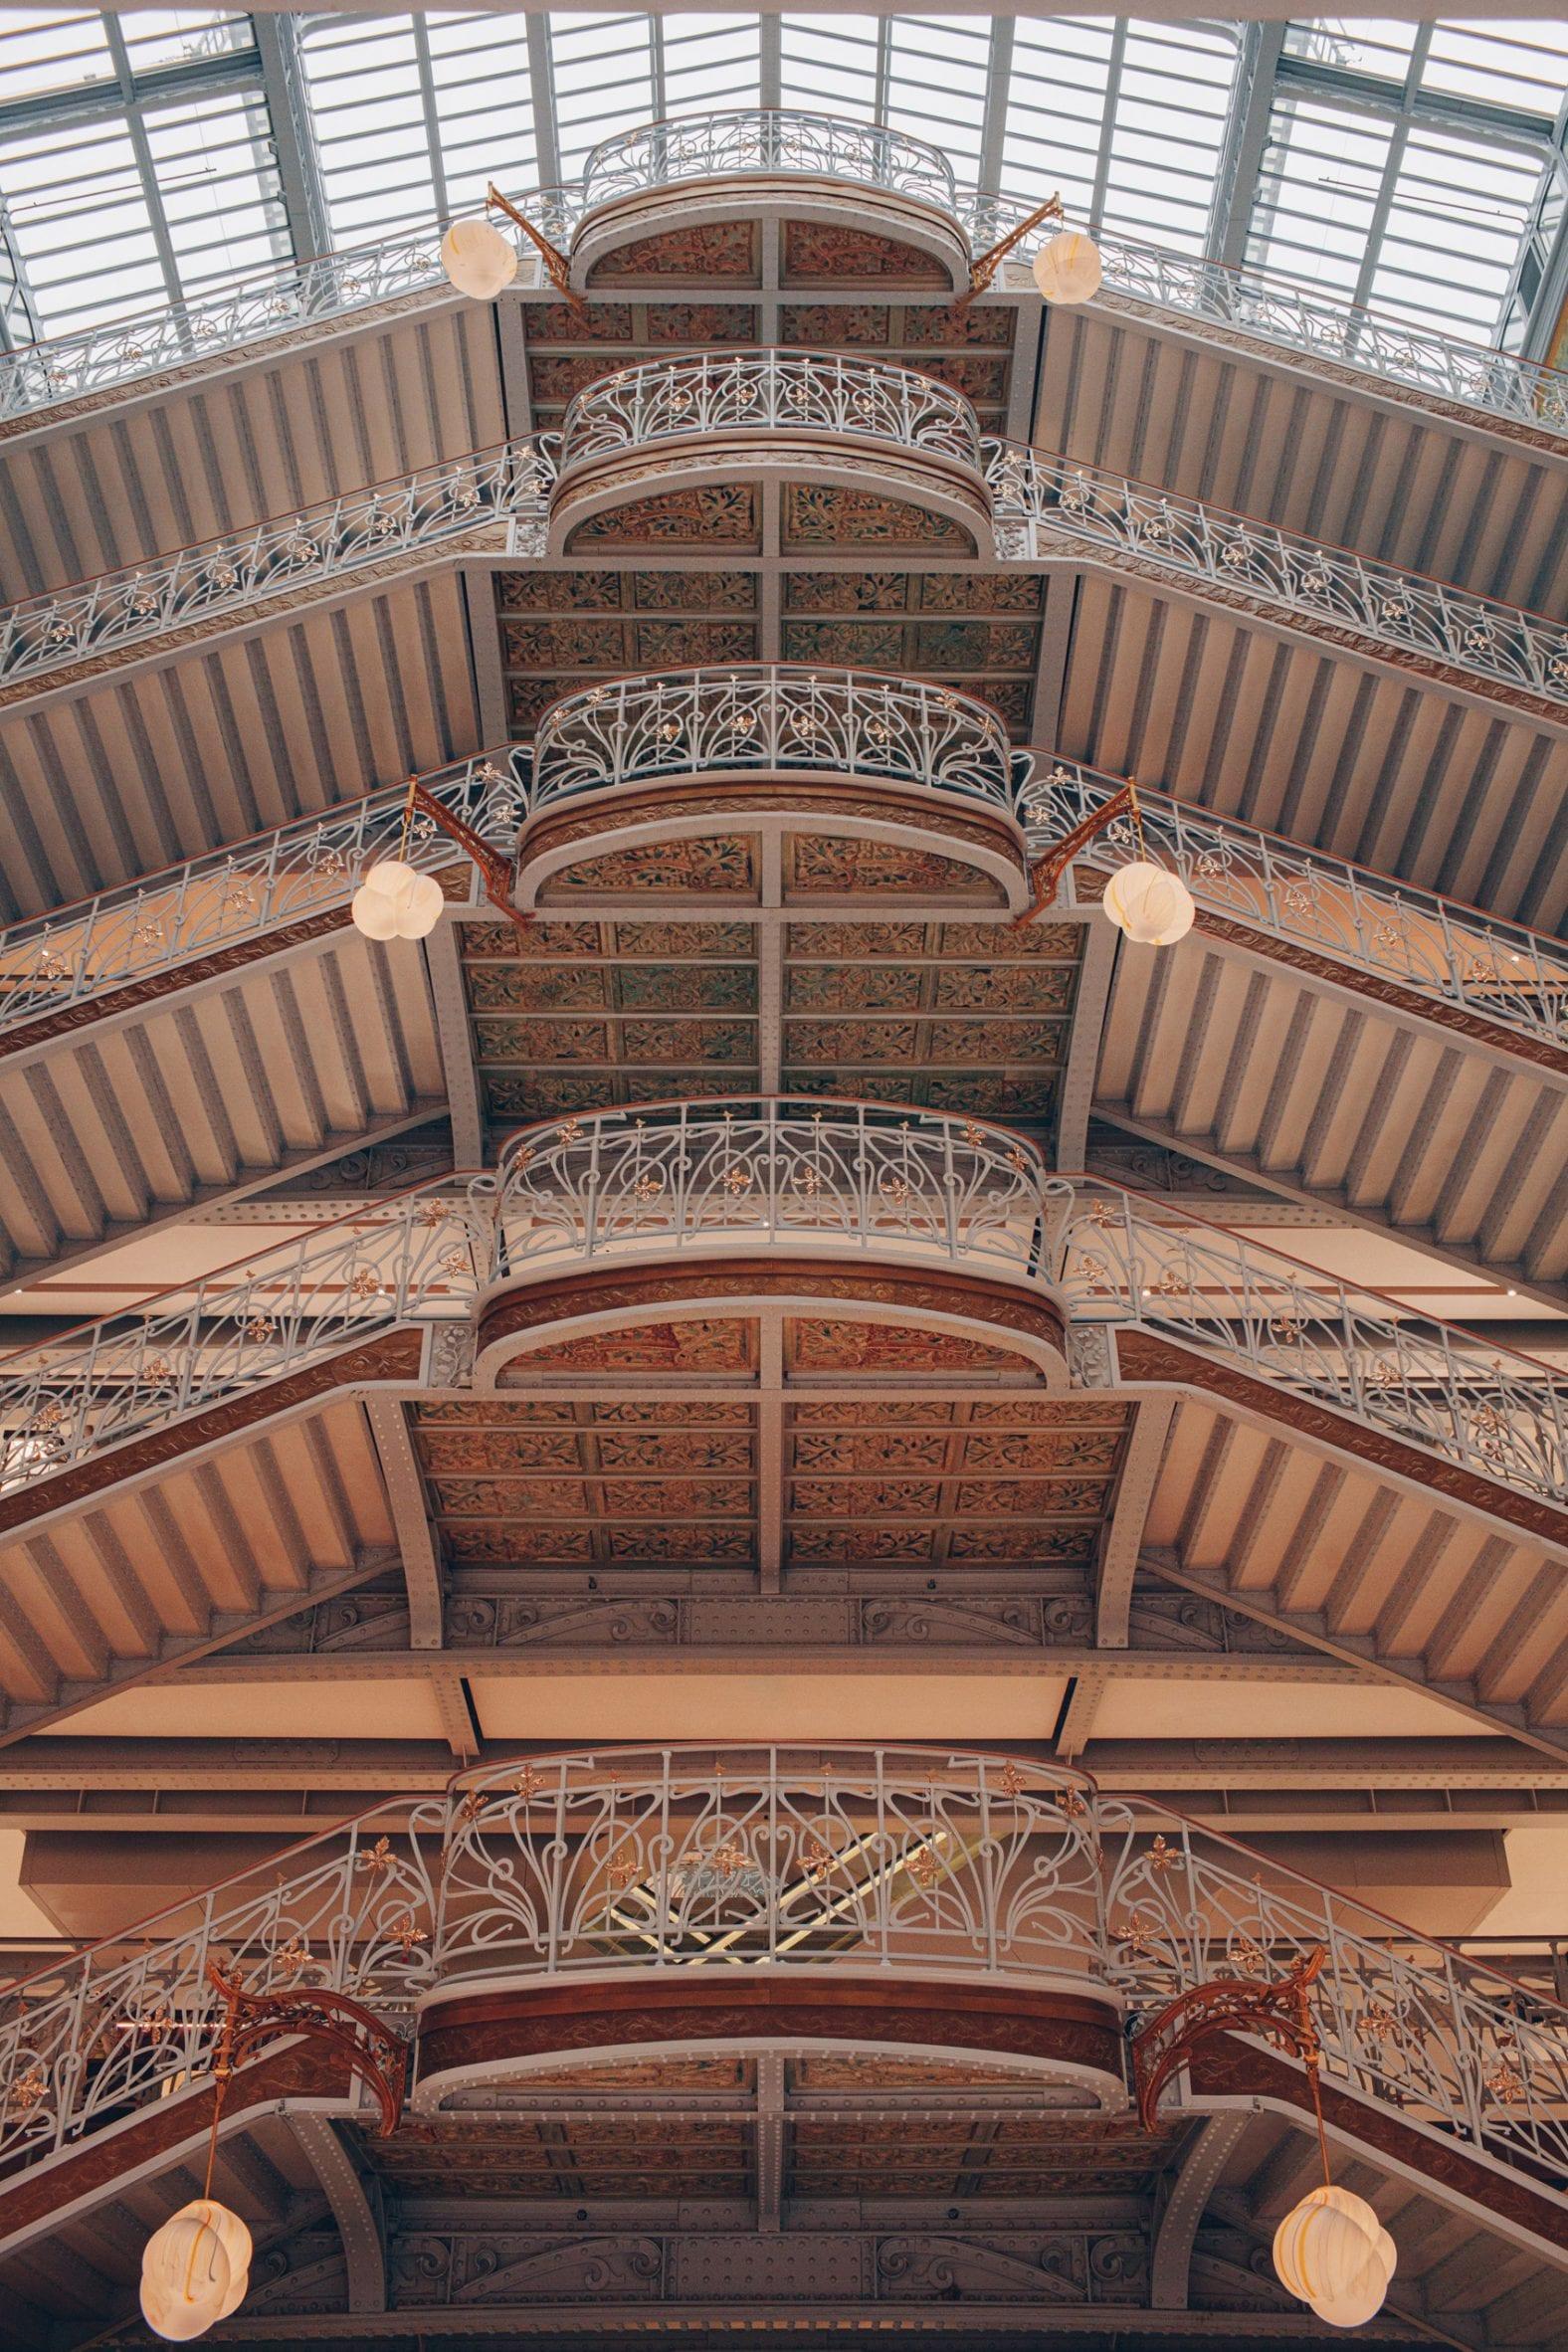 la-samaritaine-sanaa-architecture-renovations-paris-france_dezeen_1704_col_10-scaled.jpg